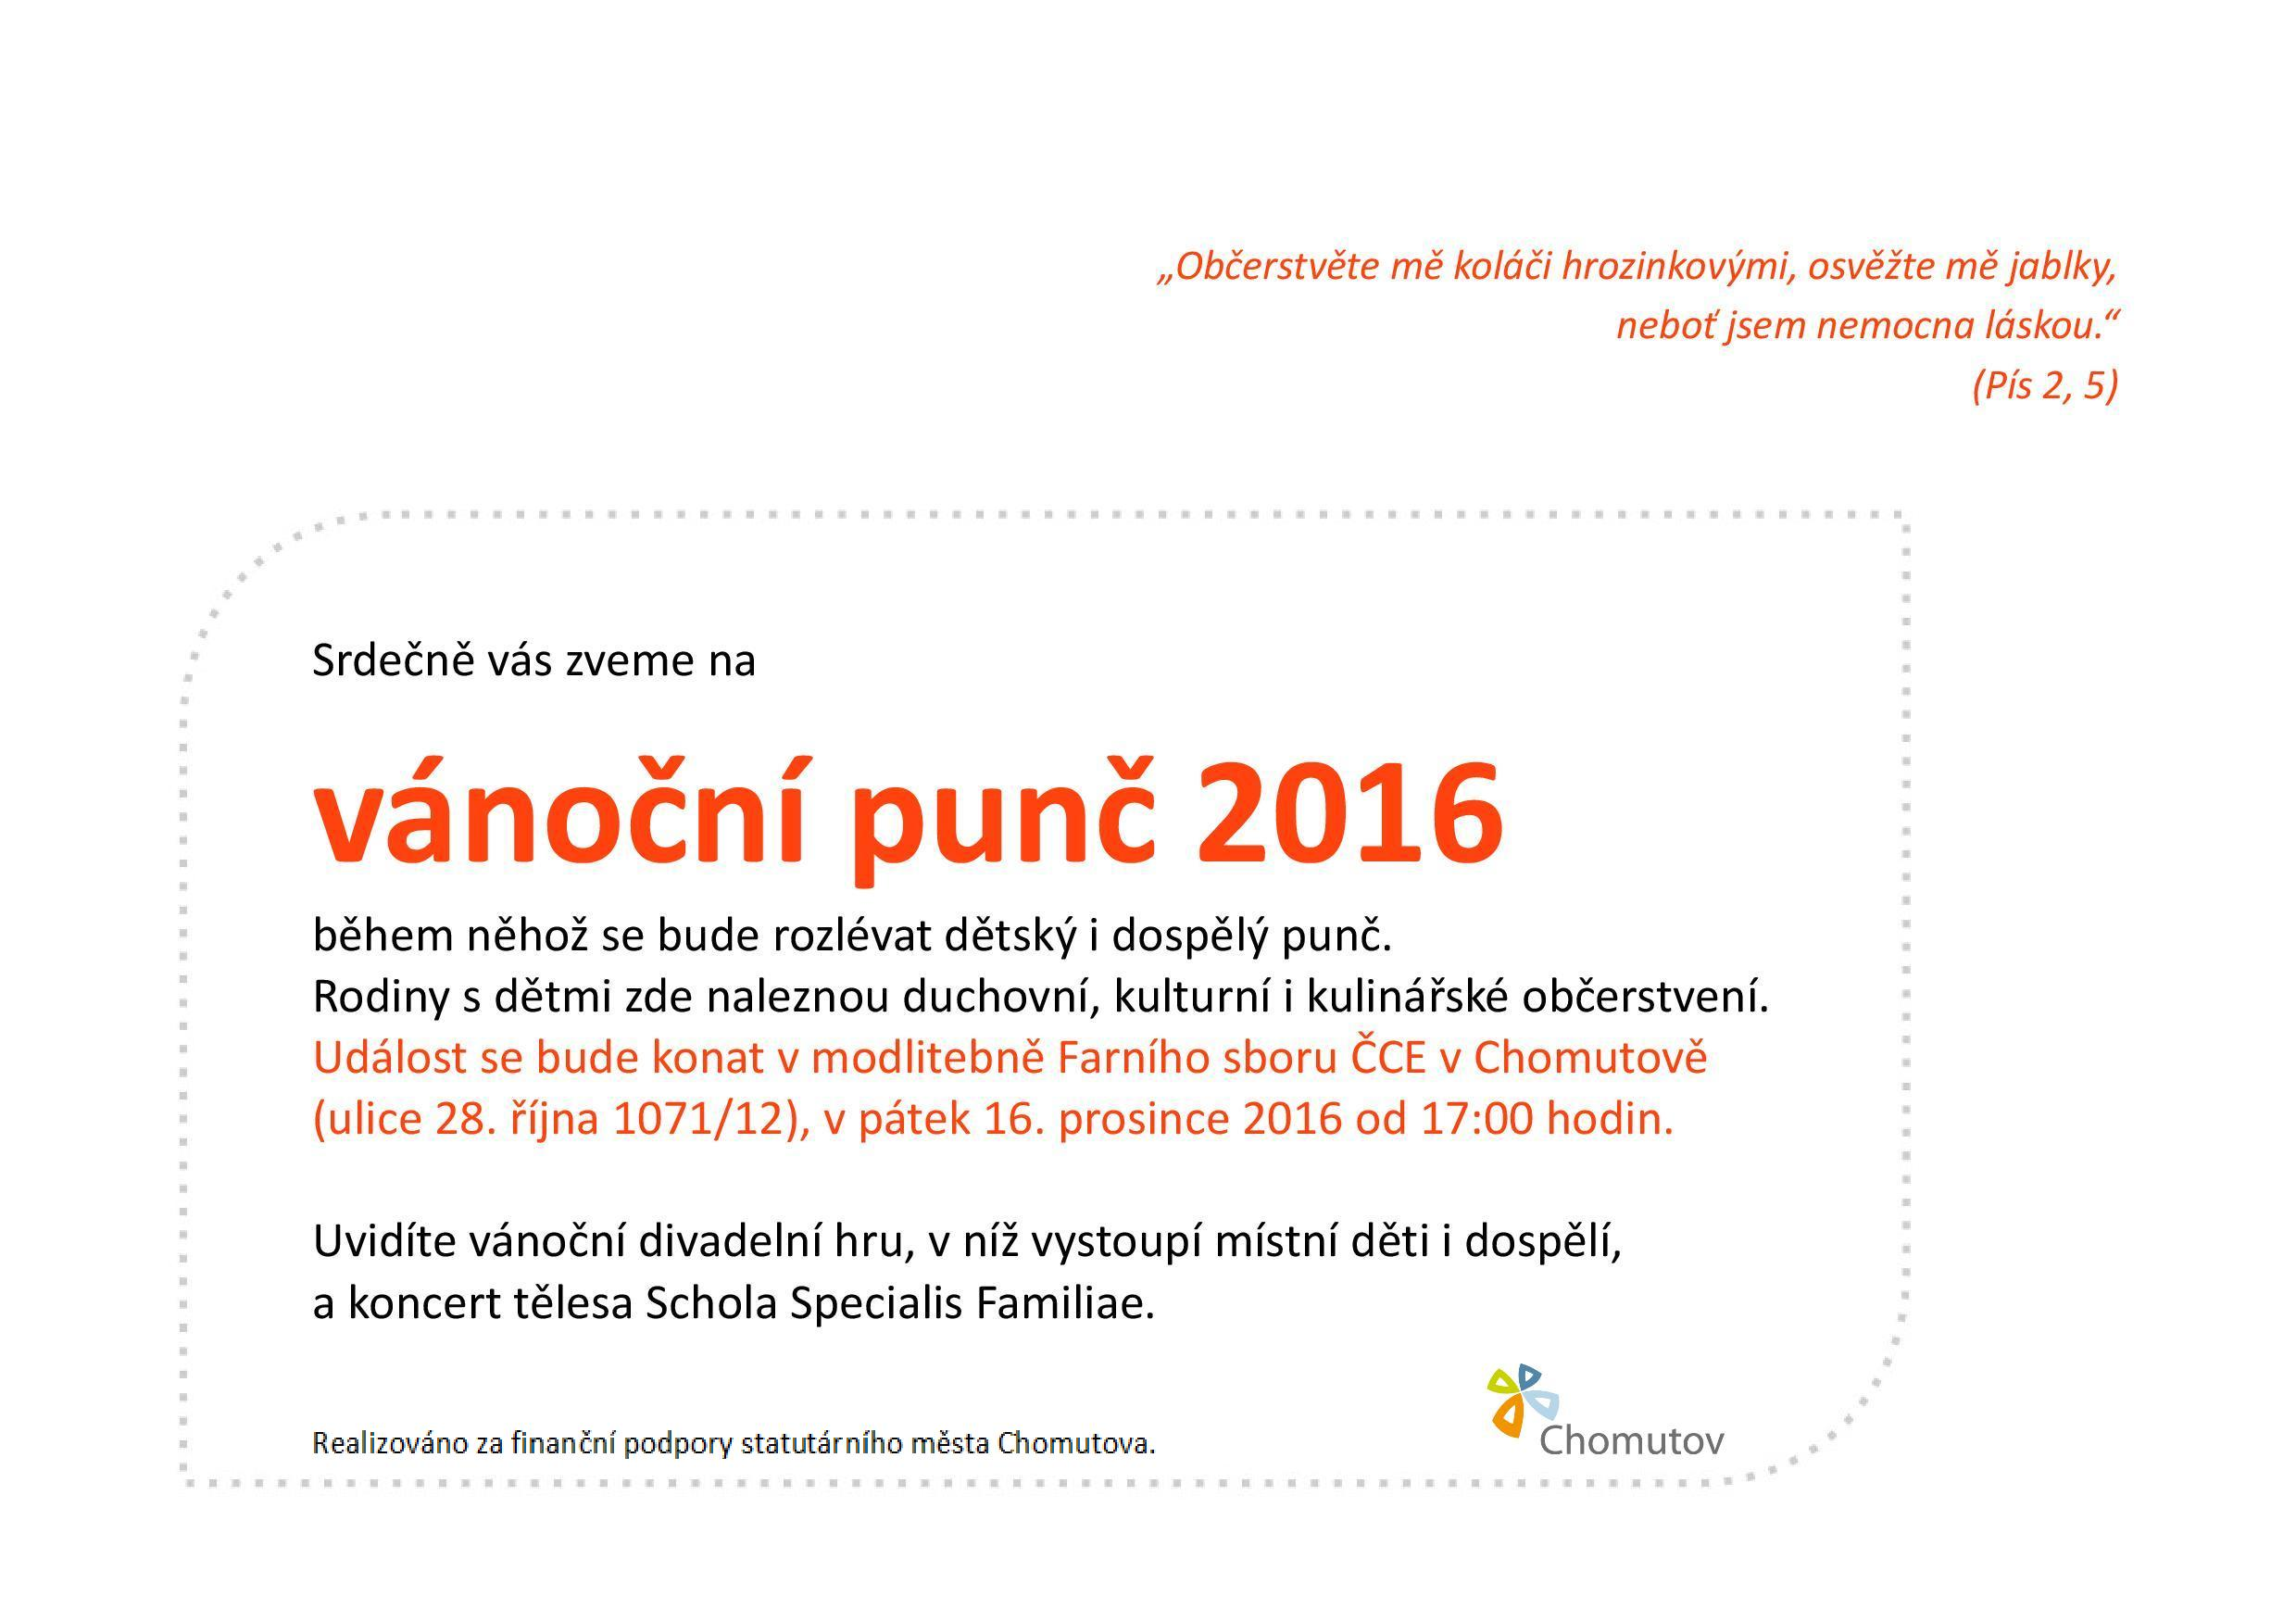 vanocni-punc-2016-page-001